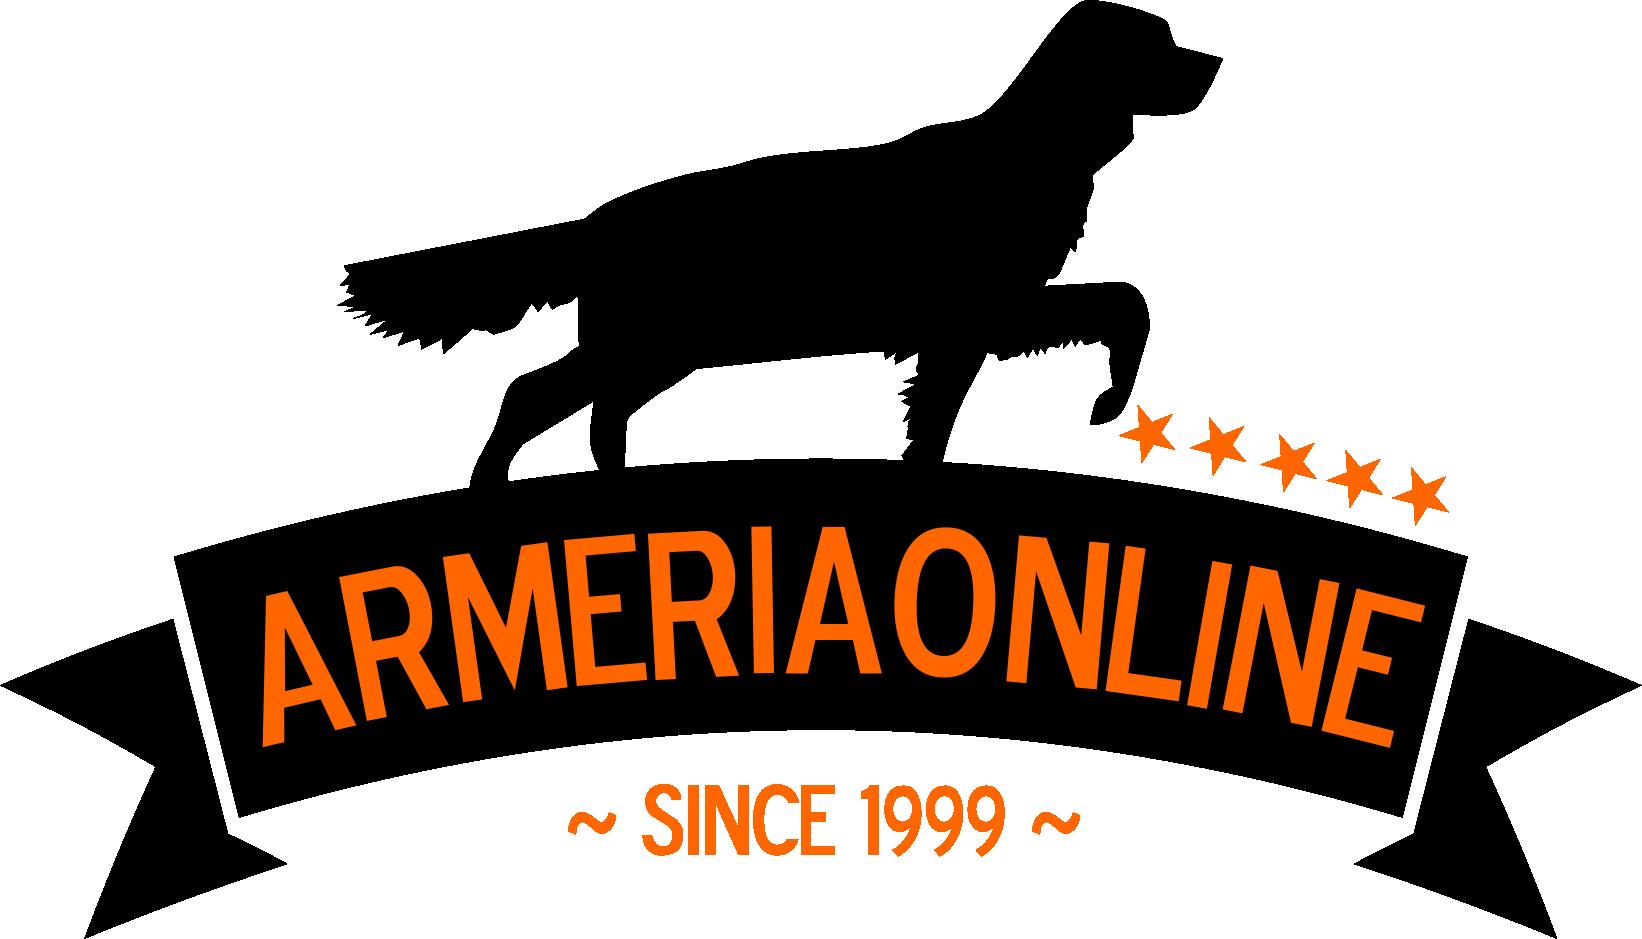 logo armeriaonline